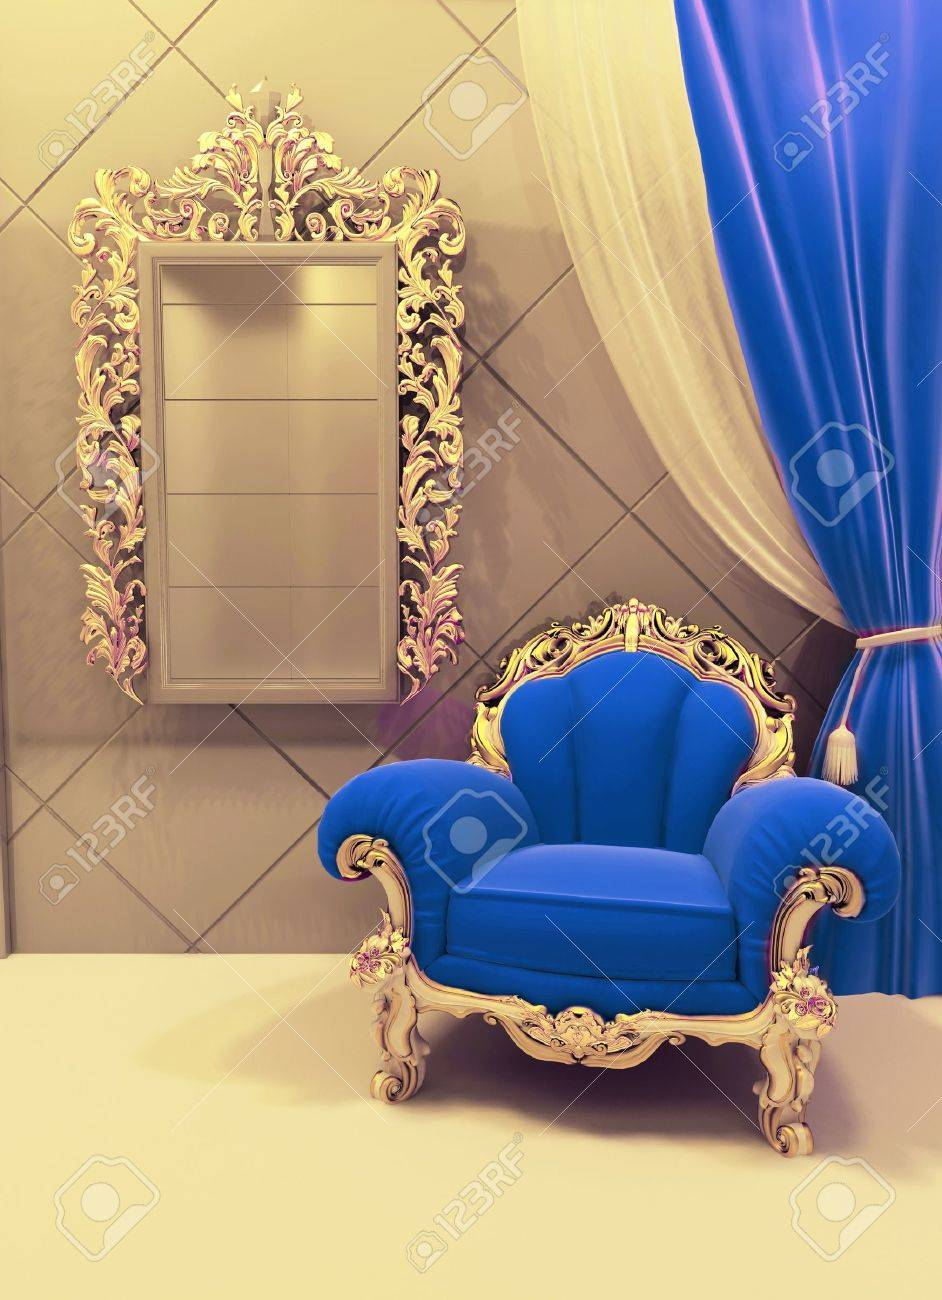 Royal  furniture in a luxurious interior, dark blue velvet, pattern Stock Photo - 10099630